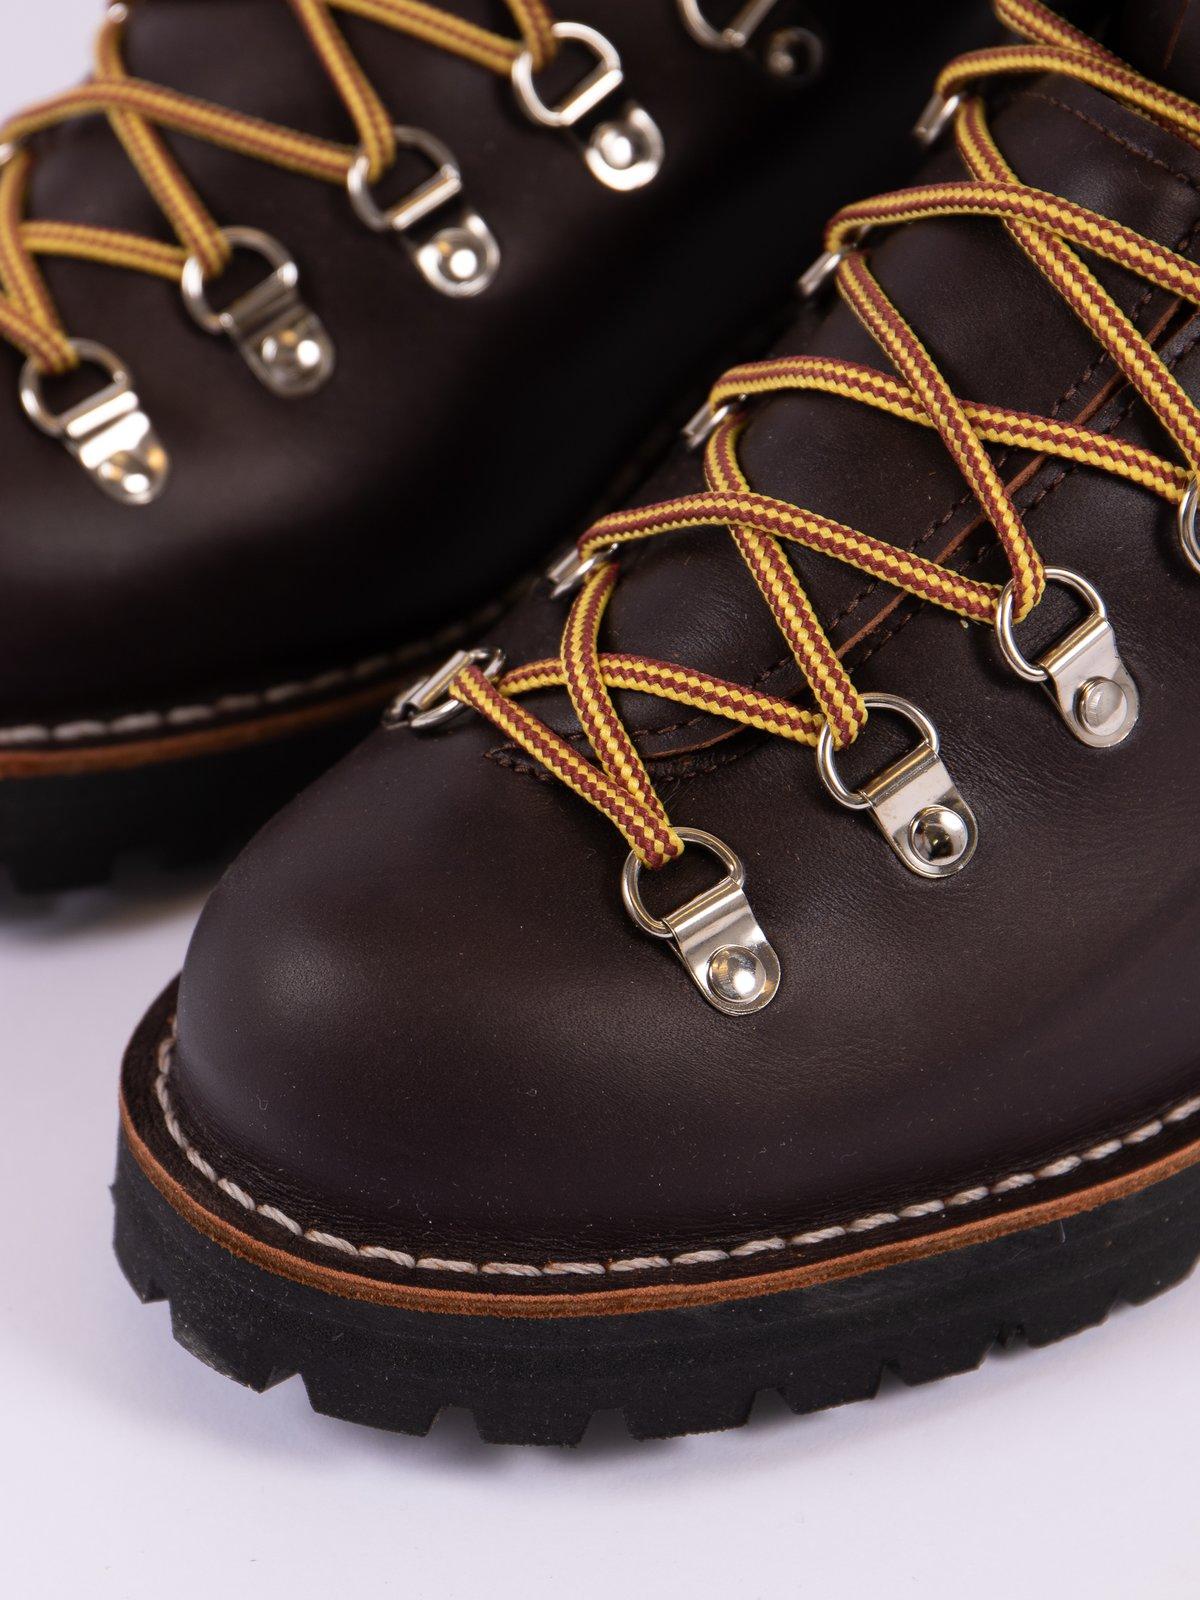 Dark Brown Mountain Light Boot - Image 3